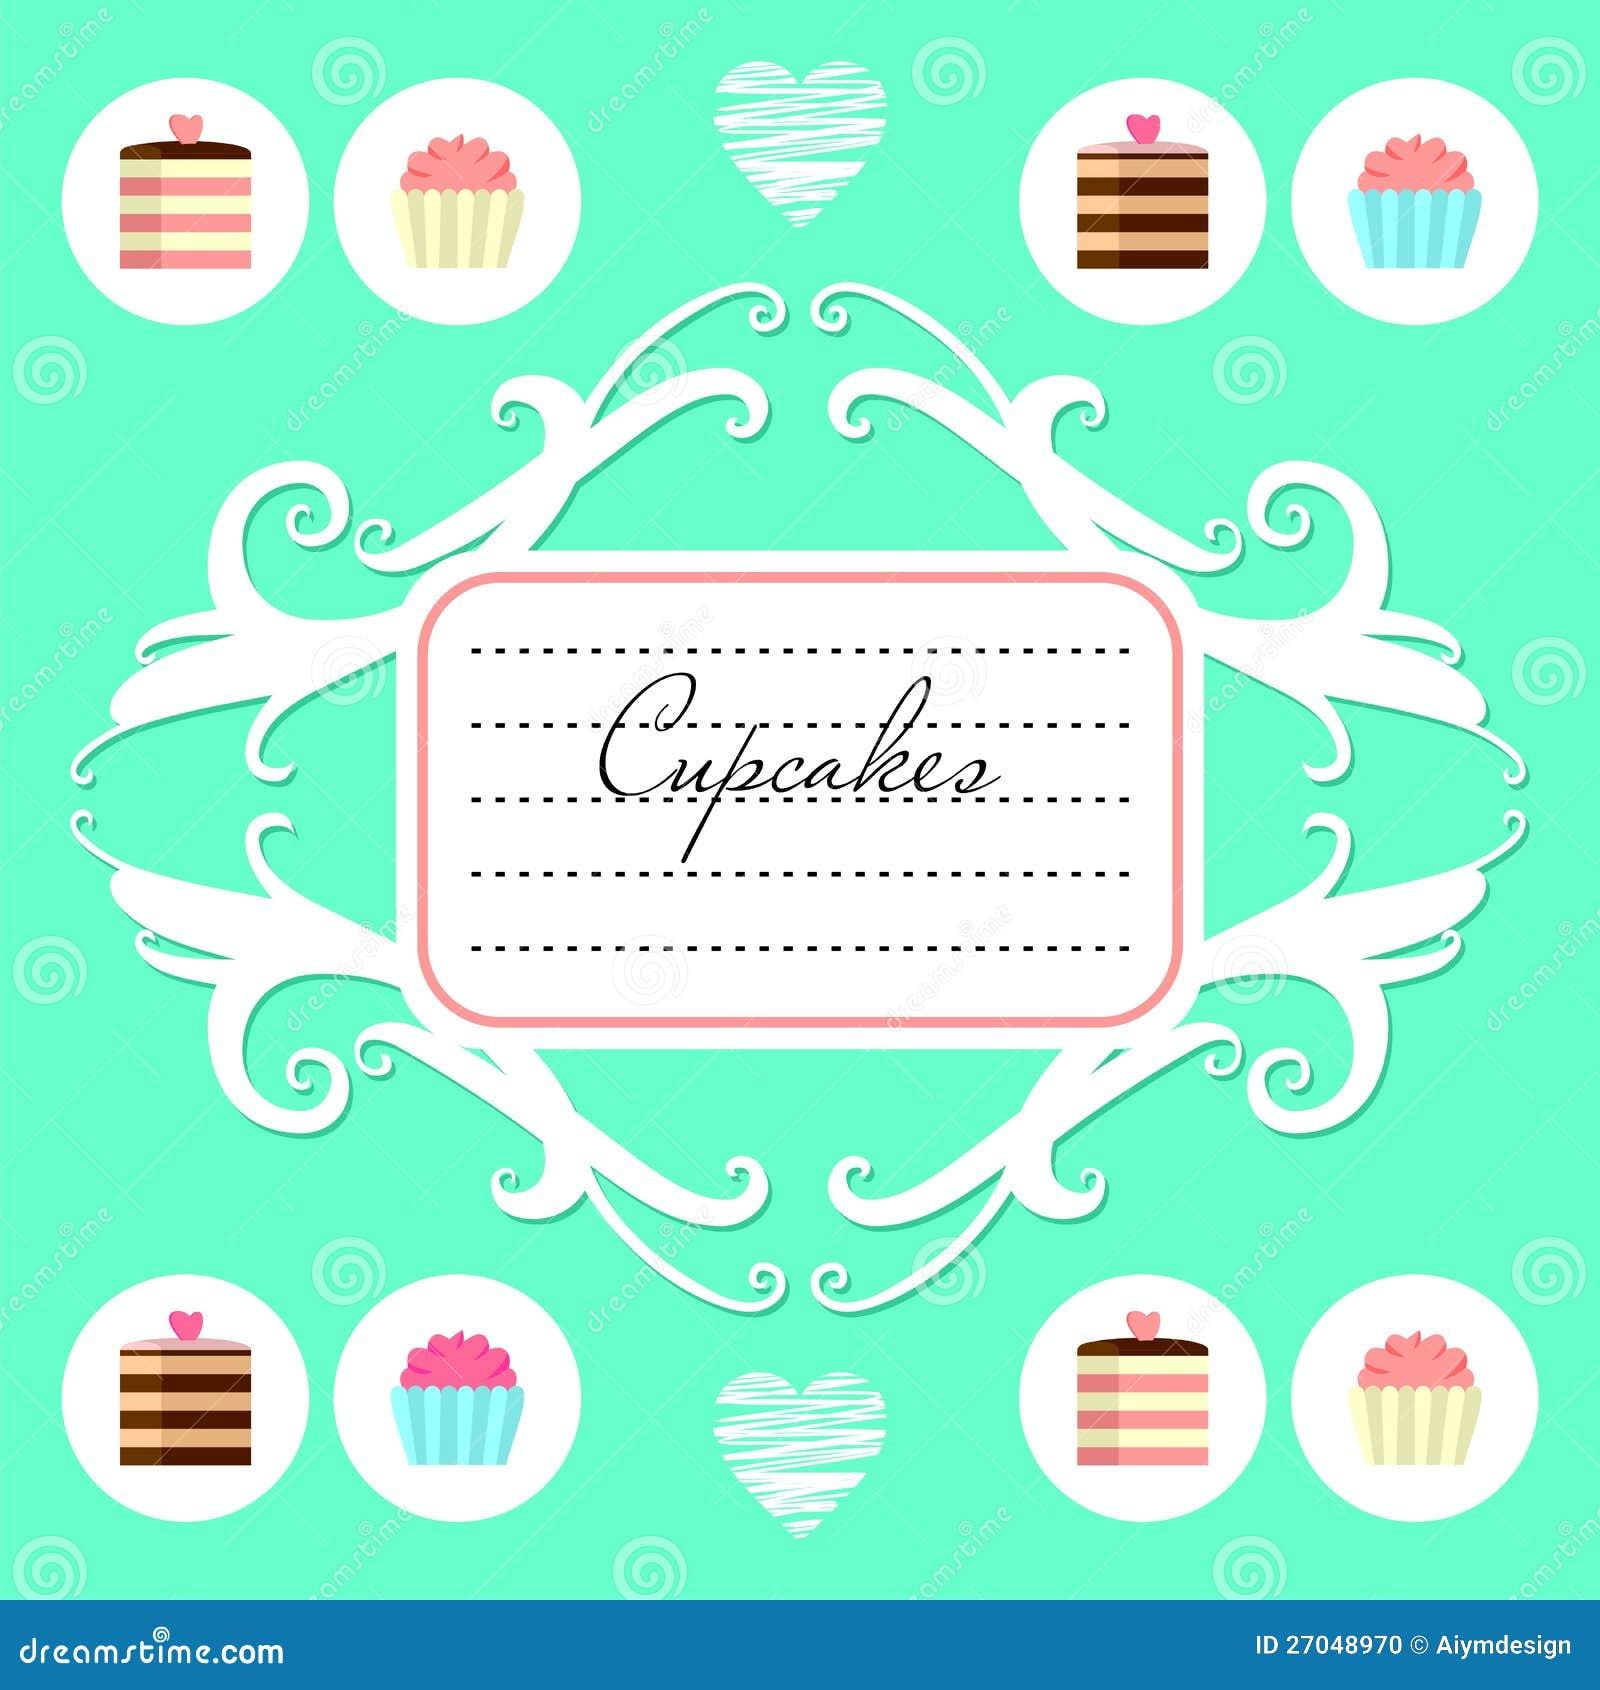 cute dessert menu design stock vector image of decoration 27048970. Black Bedroom Furniture Sets. Home Design Ideas